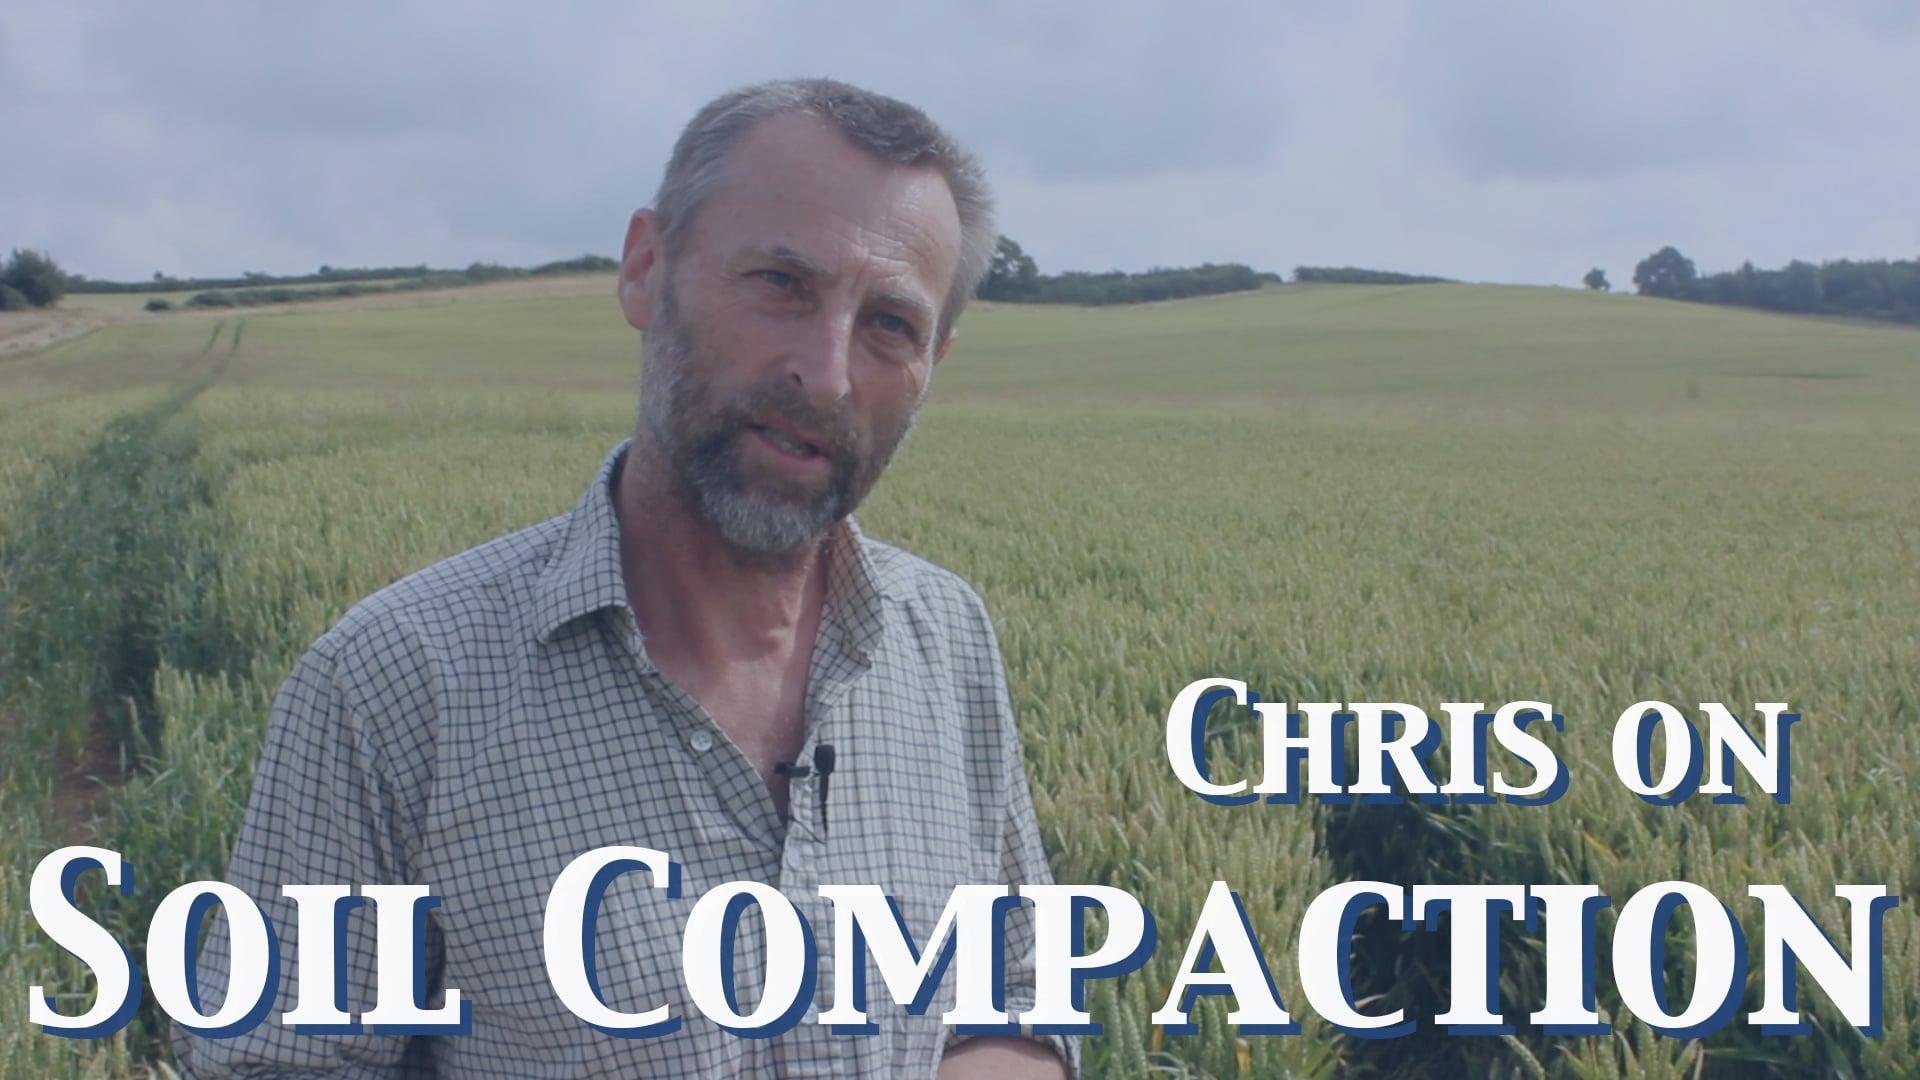 Chris on Soil Compaction